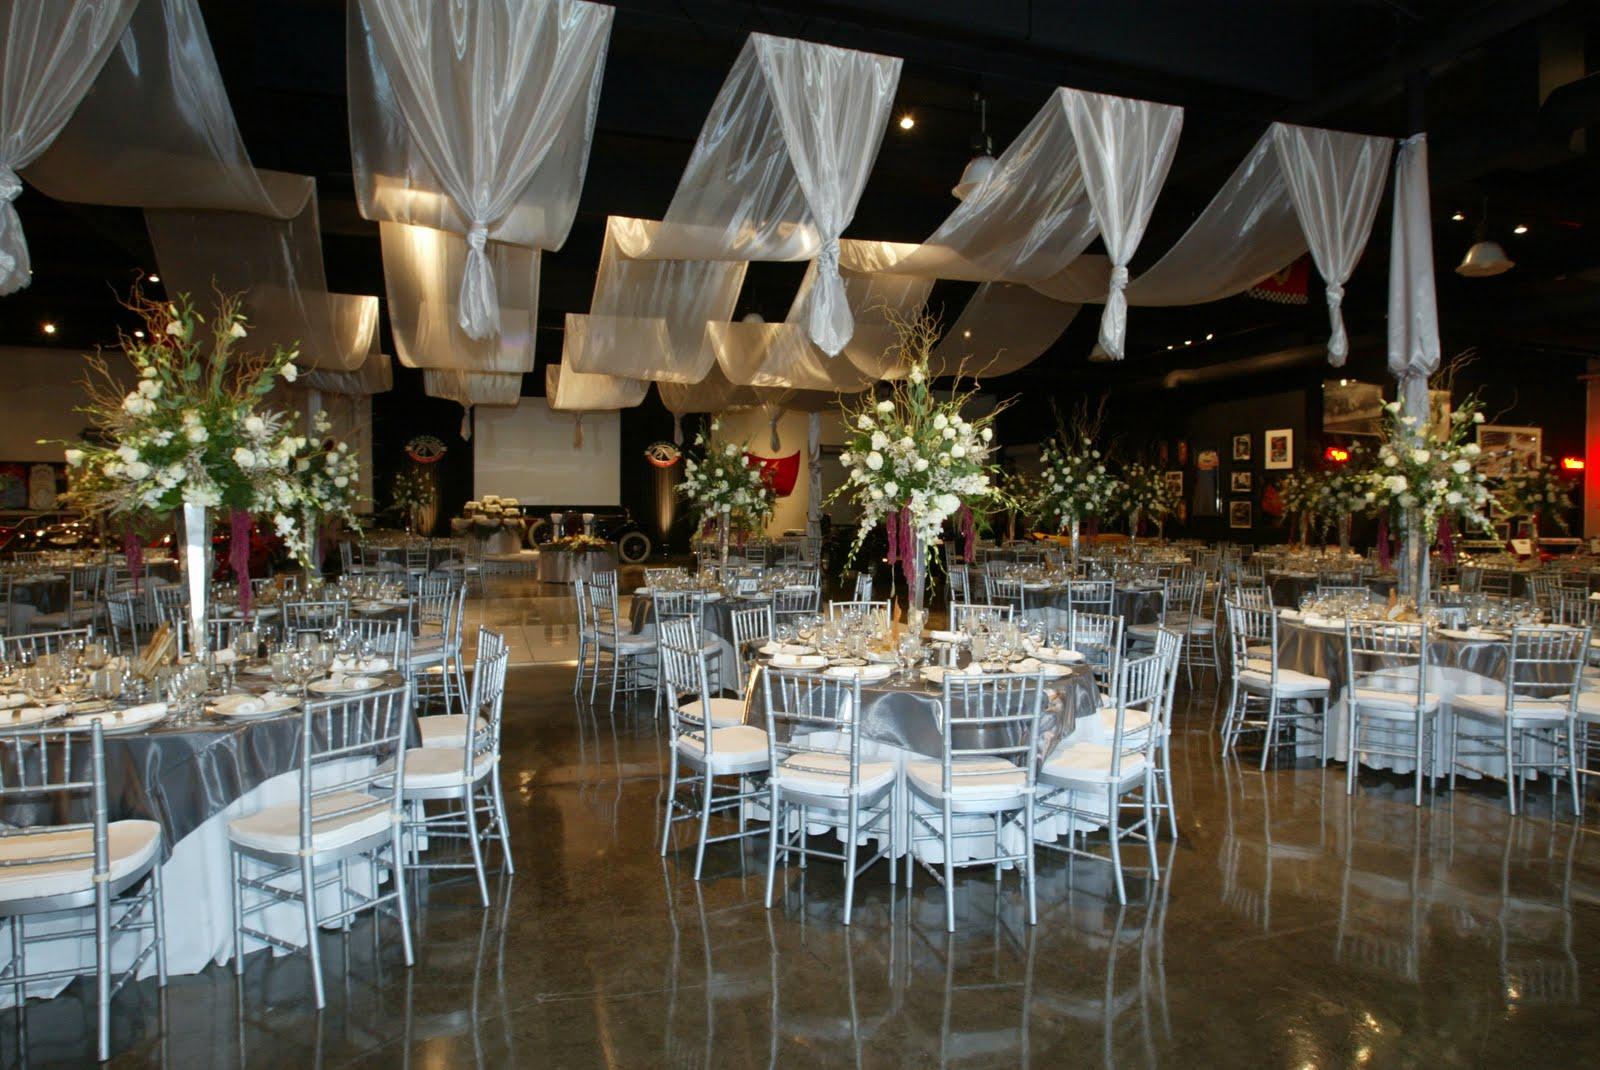 Royal Wedding Accessories: Wedding Receptions